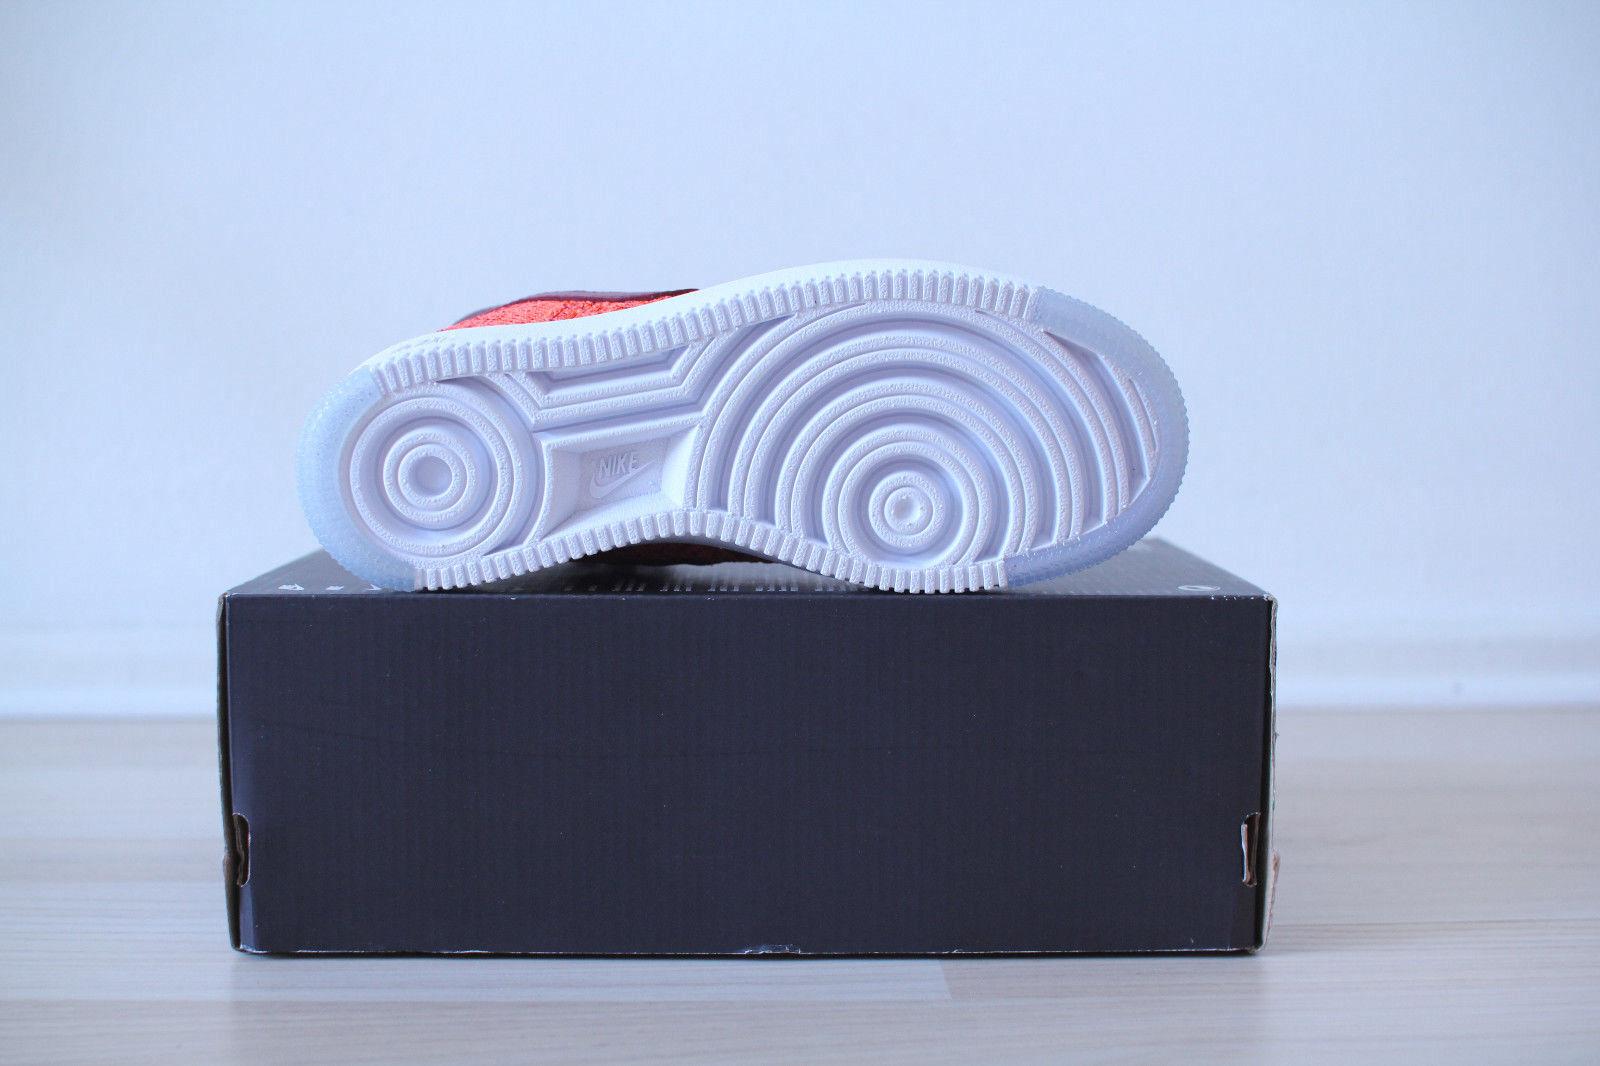 Nike Air Force 1 Ultra Flyknit Mid 36,5 WMNS Orange Weiß Gr. 36,5 Mid UK 3,5 NEU & OVP dfbb83